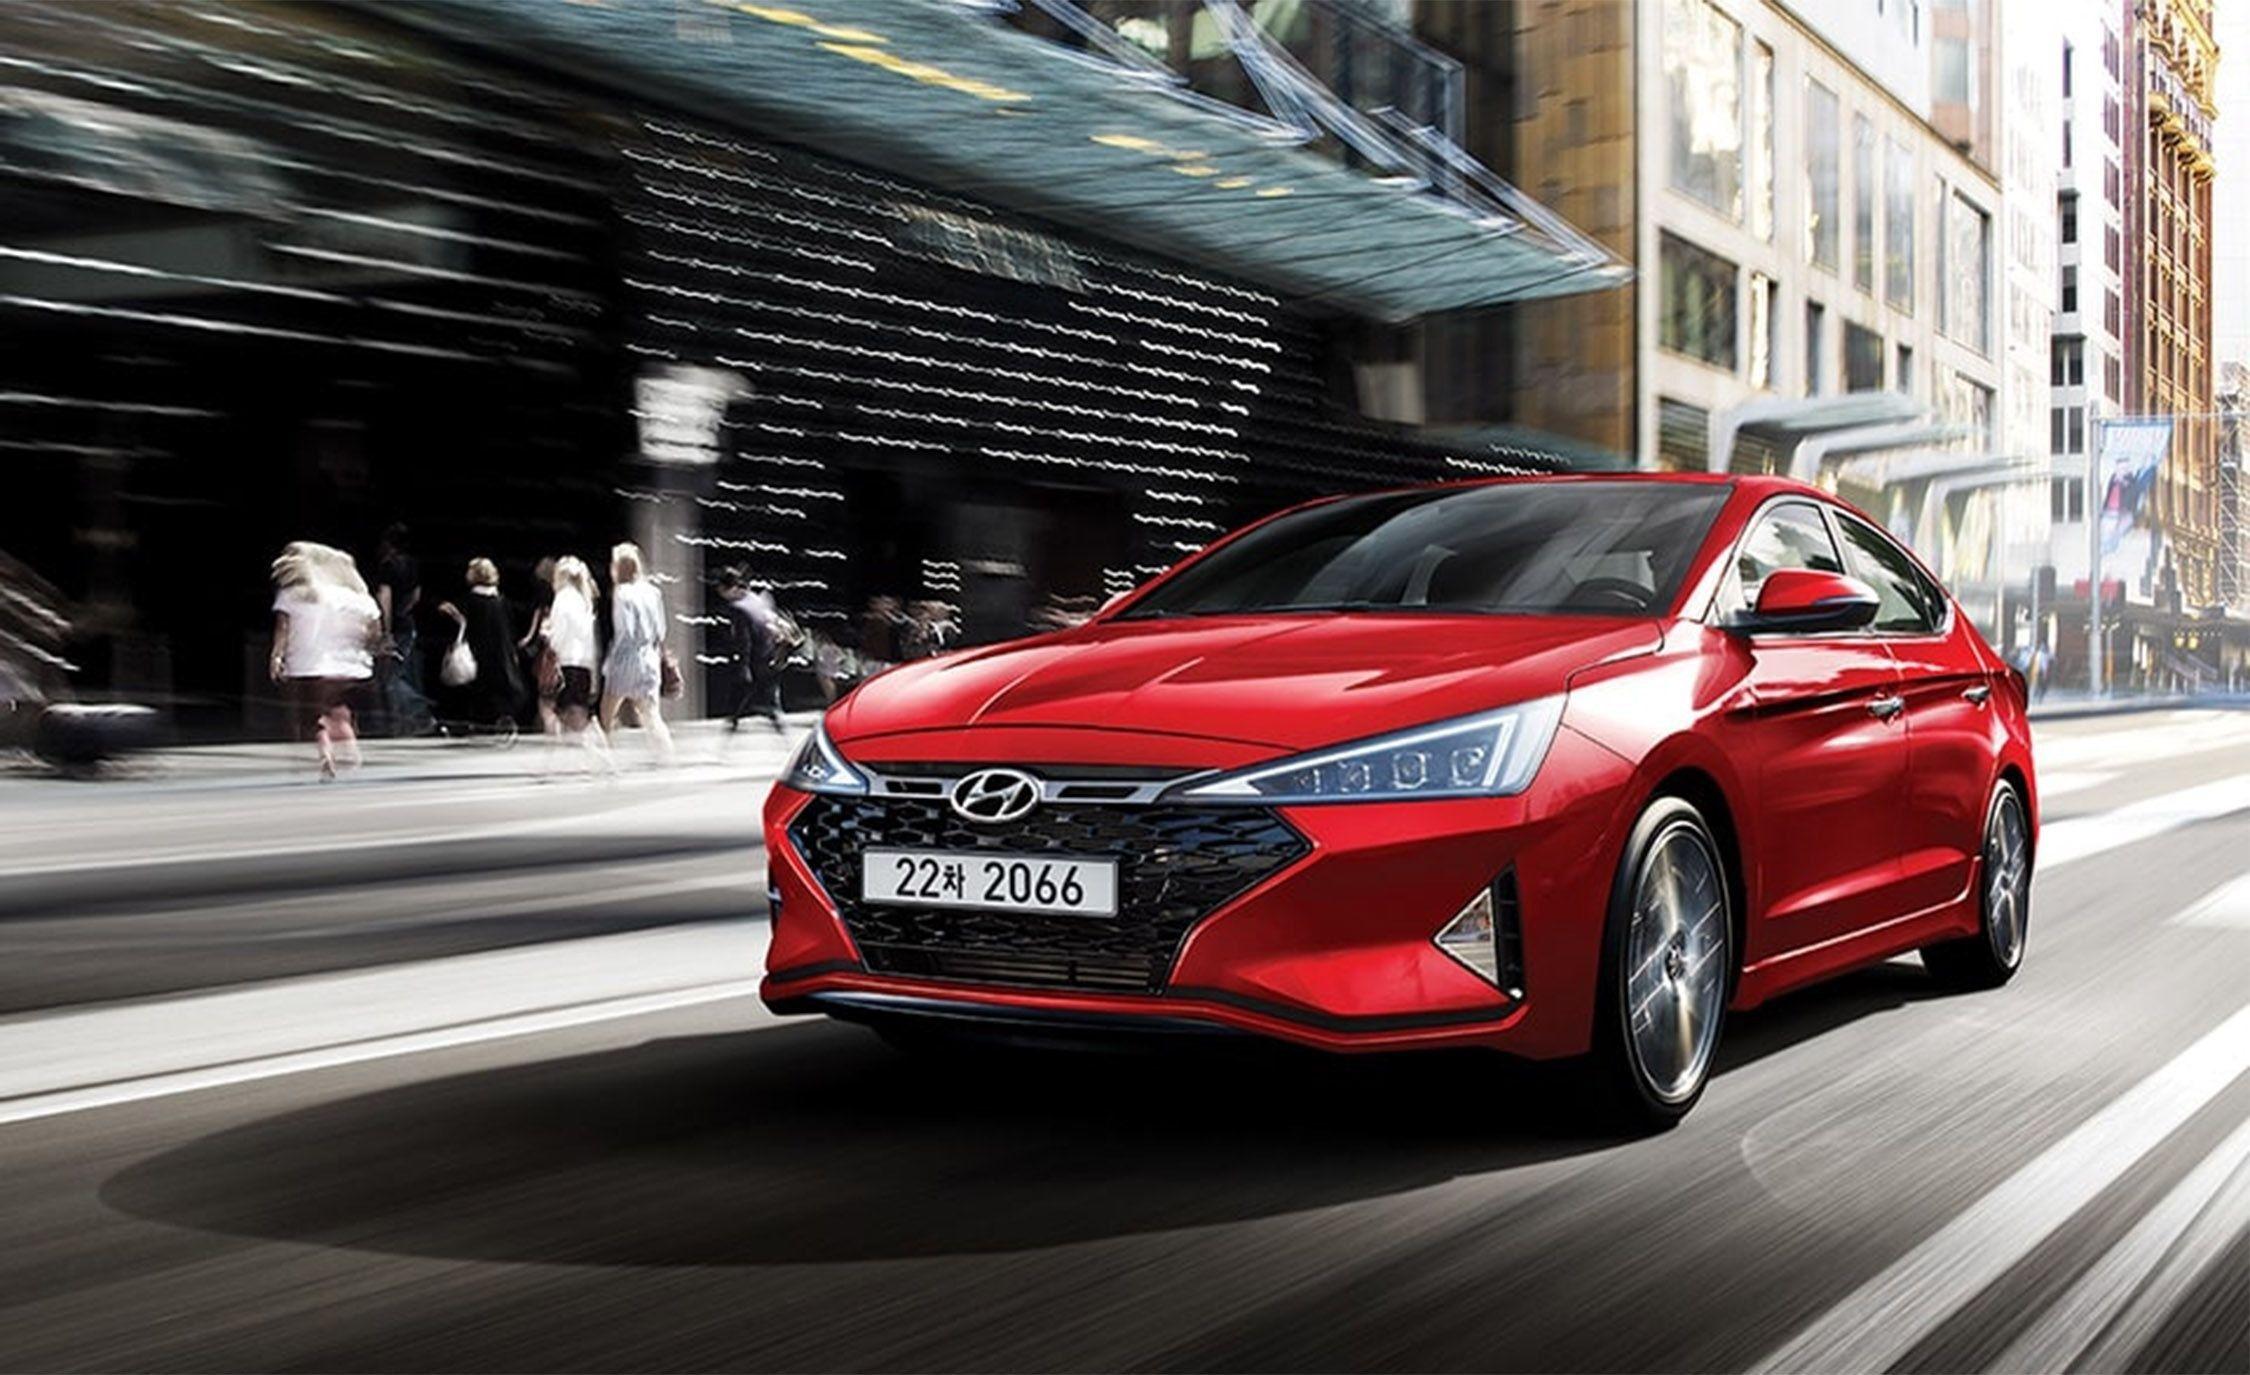 2020 Hyundai Elantra Release Date Review Hyundai Elantra Elantra Hyundai